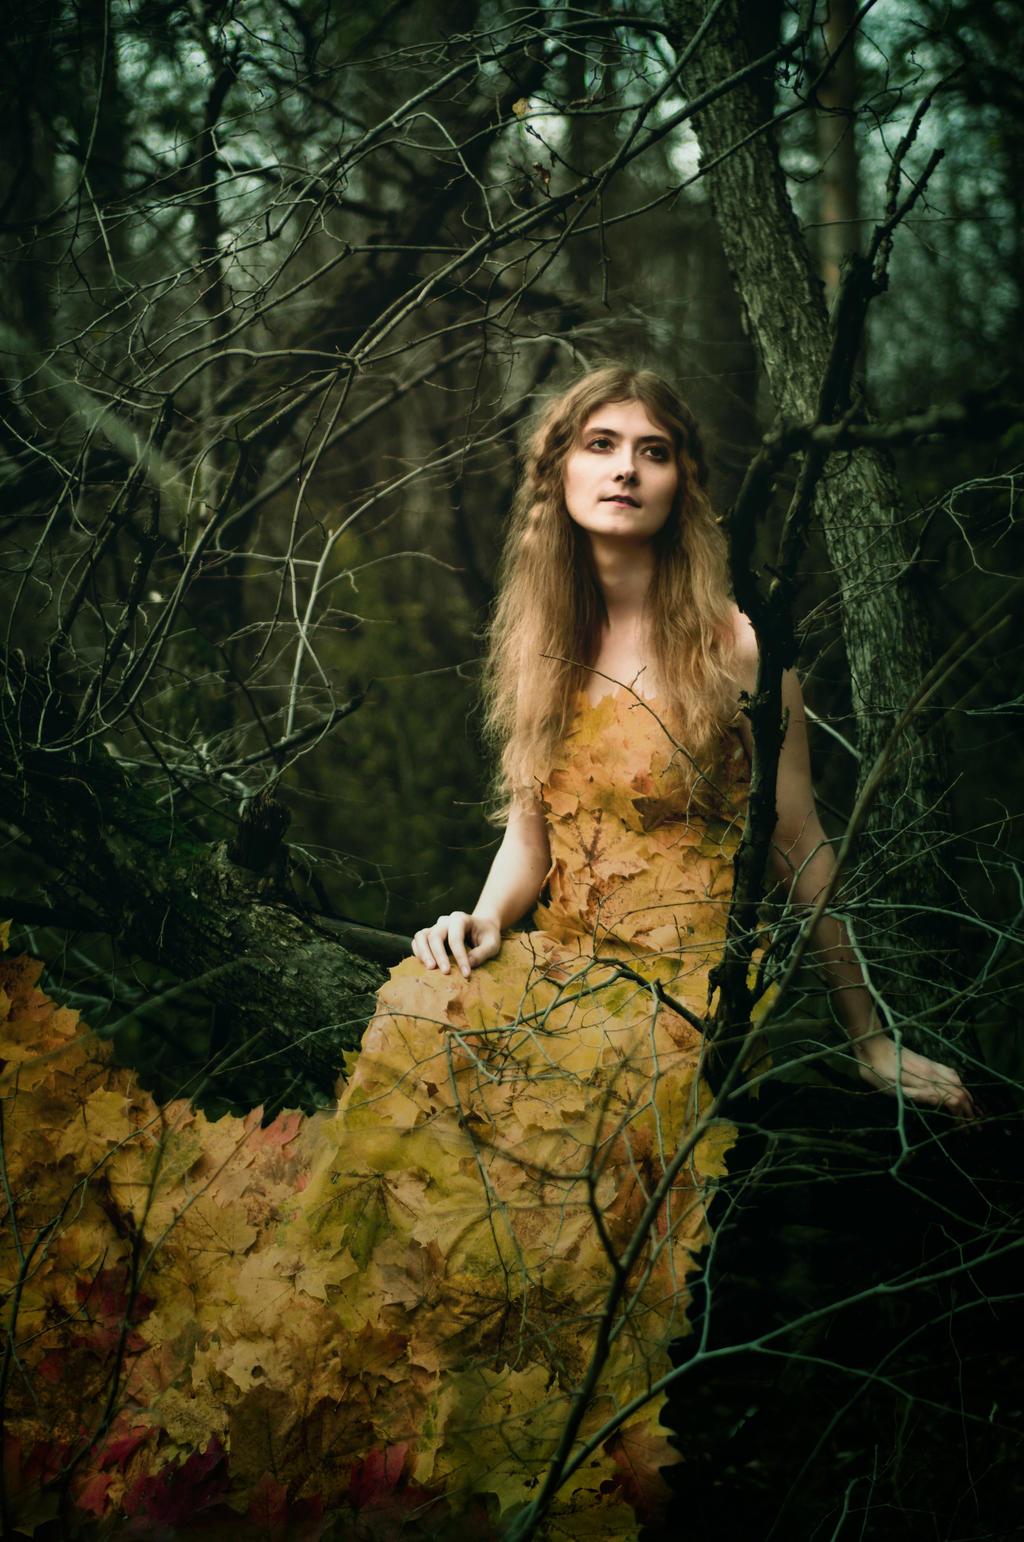 Autumn girl II by Anna-Belash